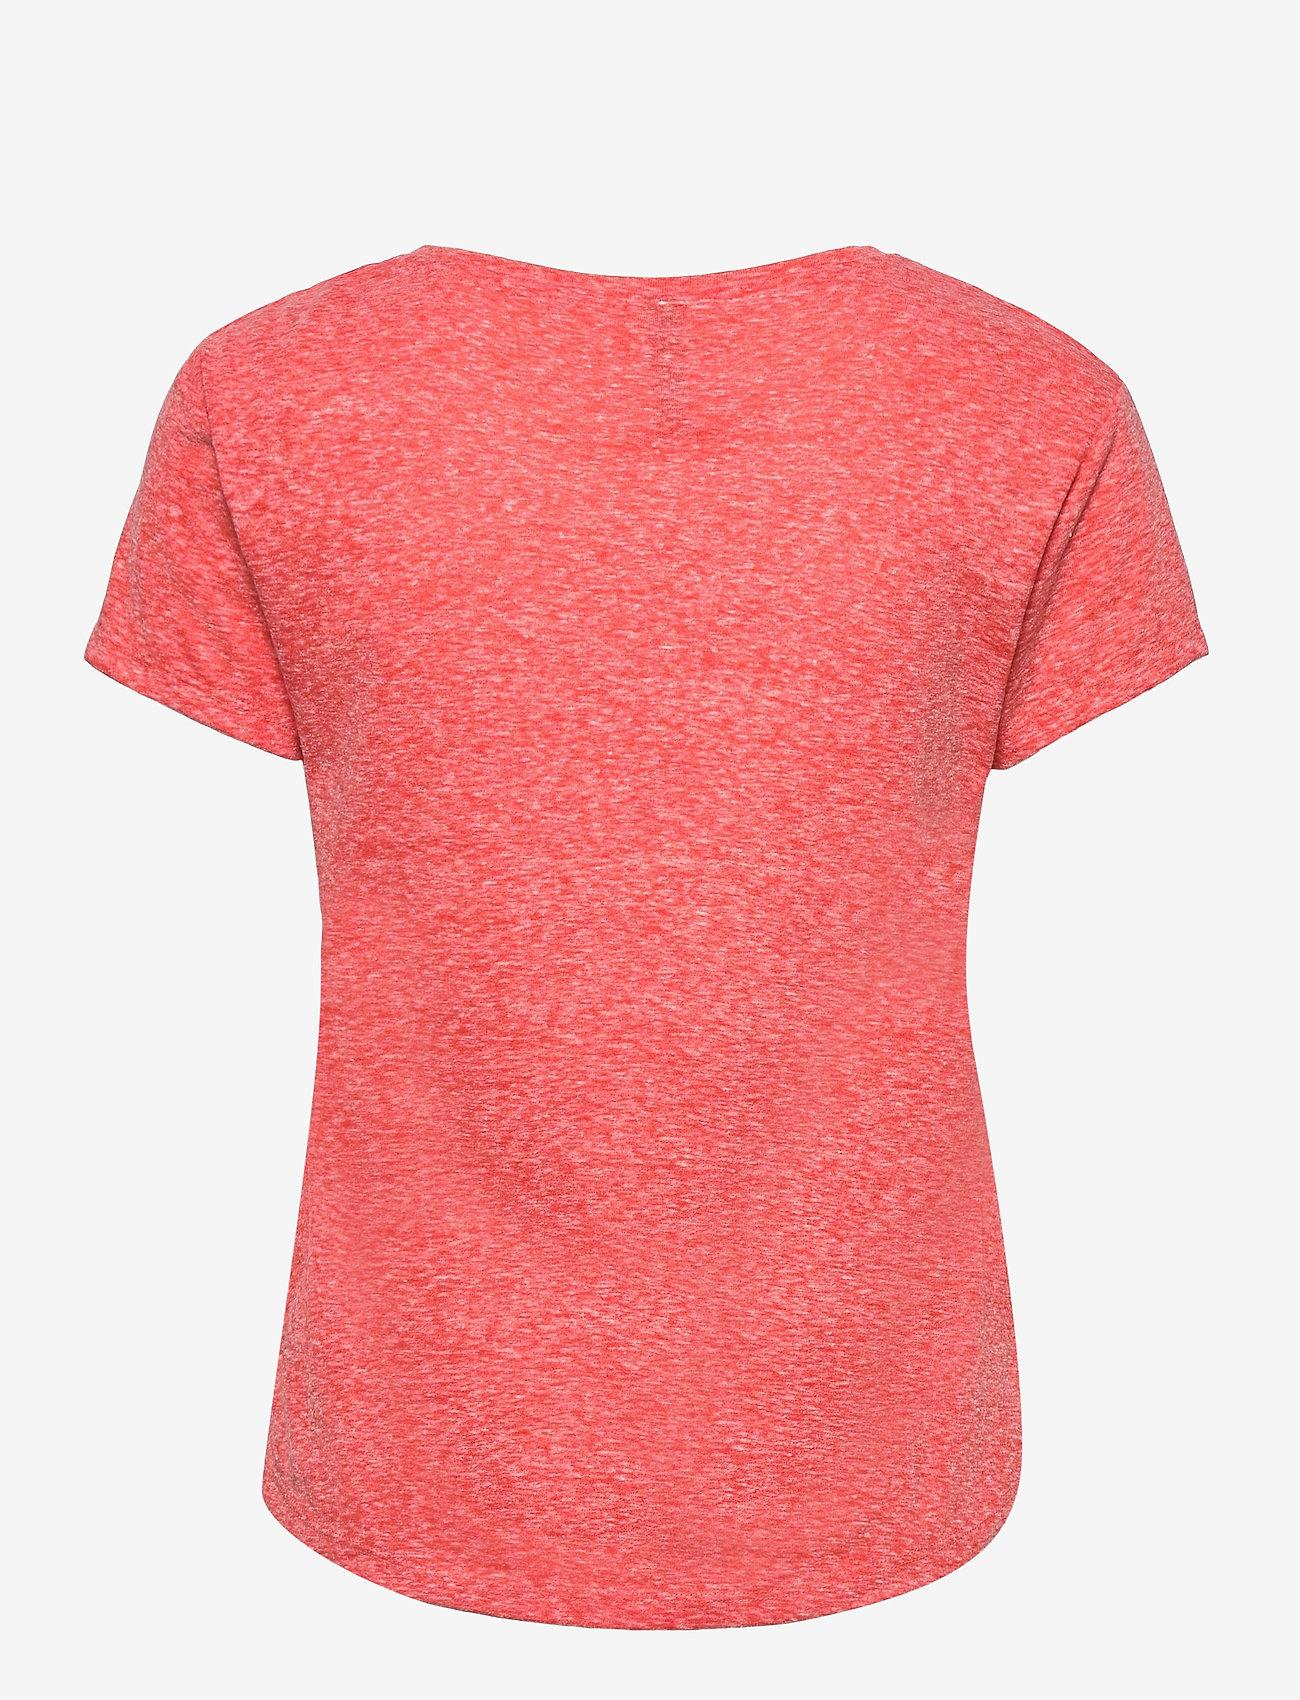 O'neill - LW ESSENTIALS T- SHIRT - t-shirts - hot coral - 1